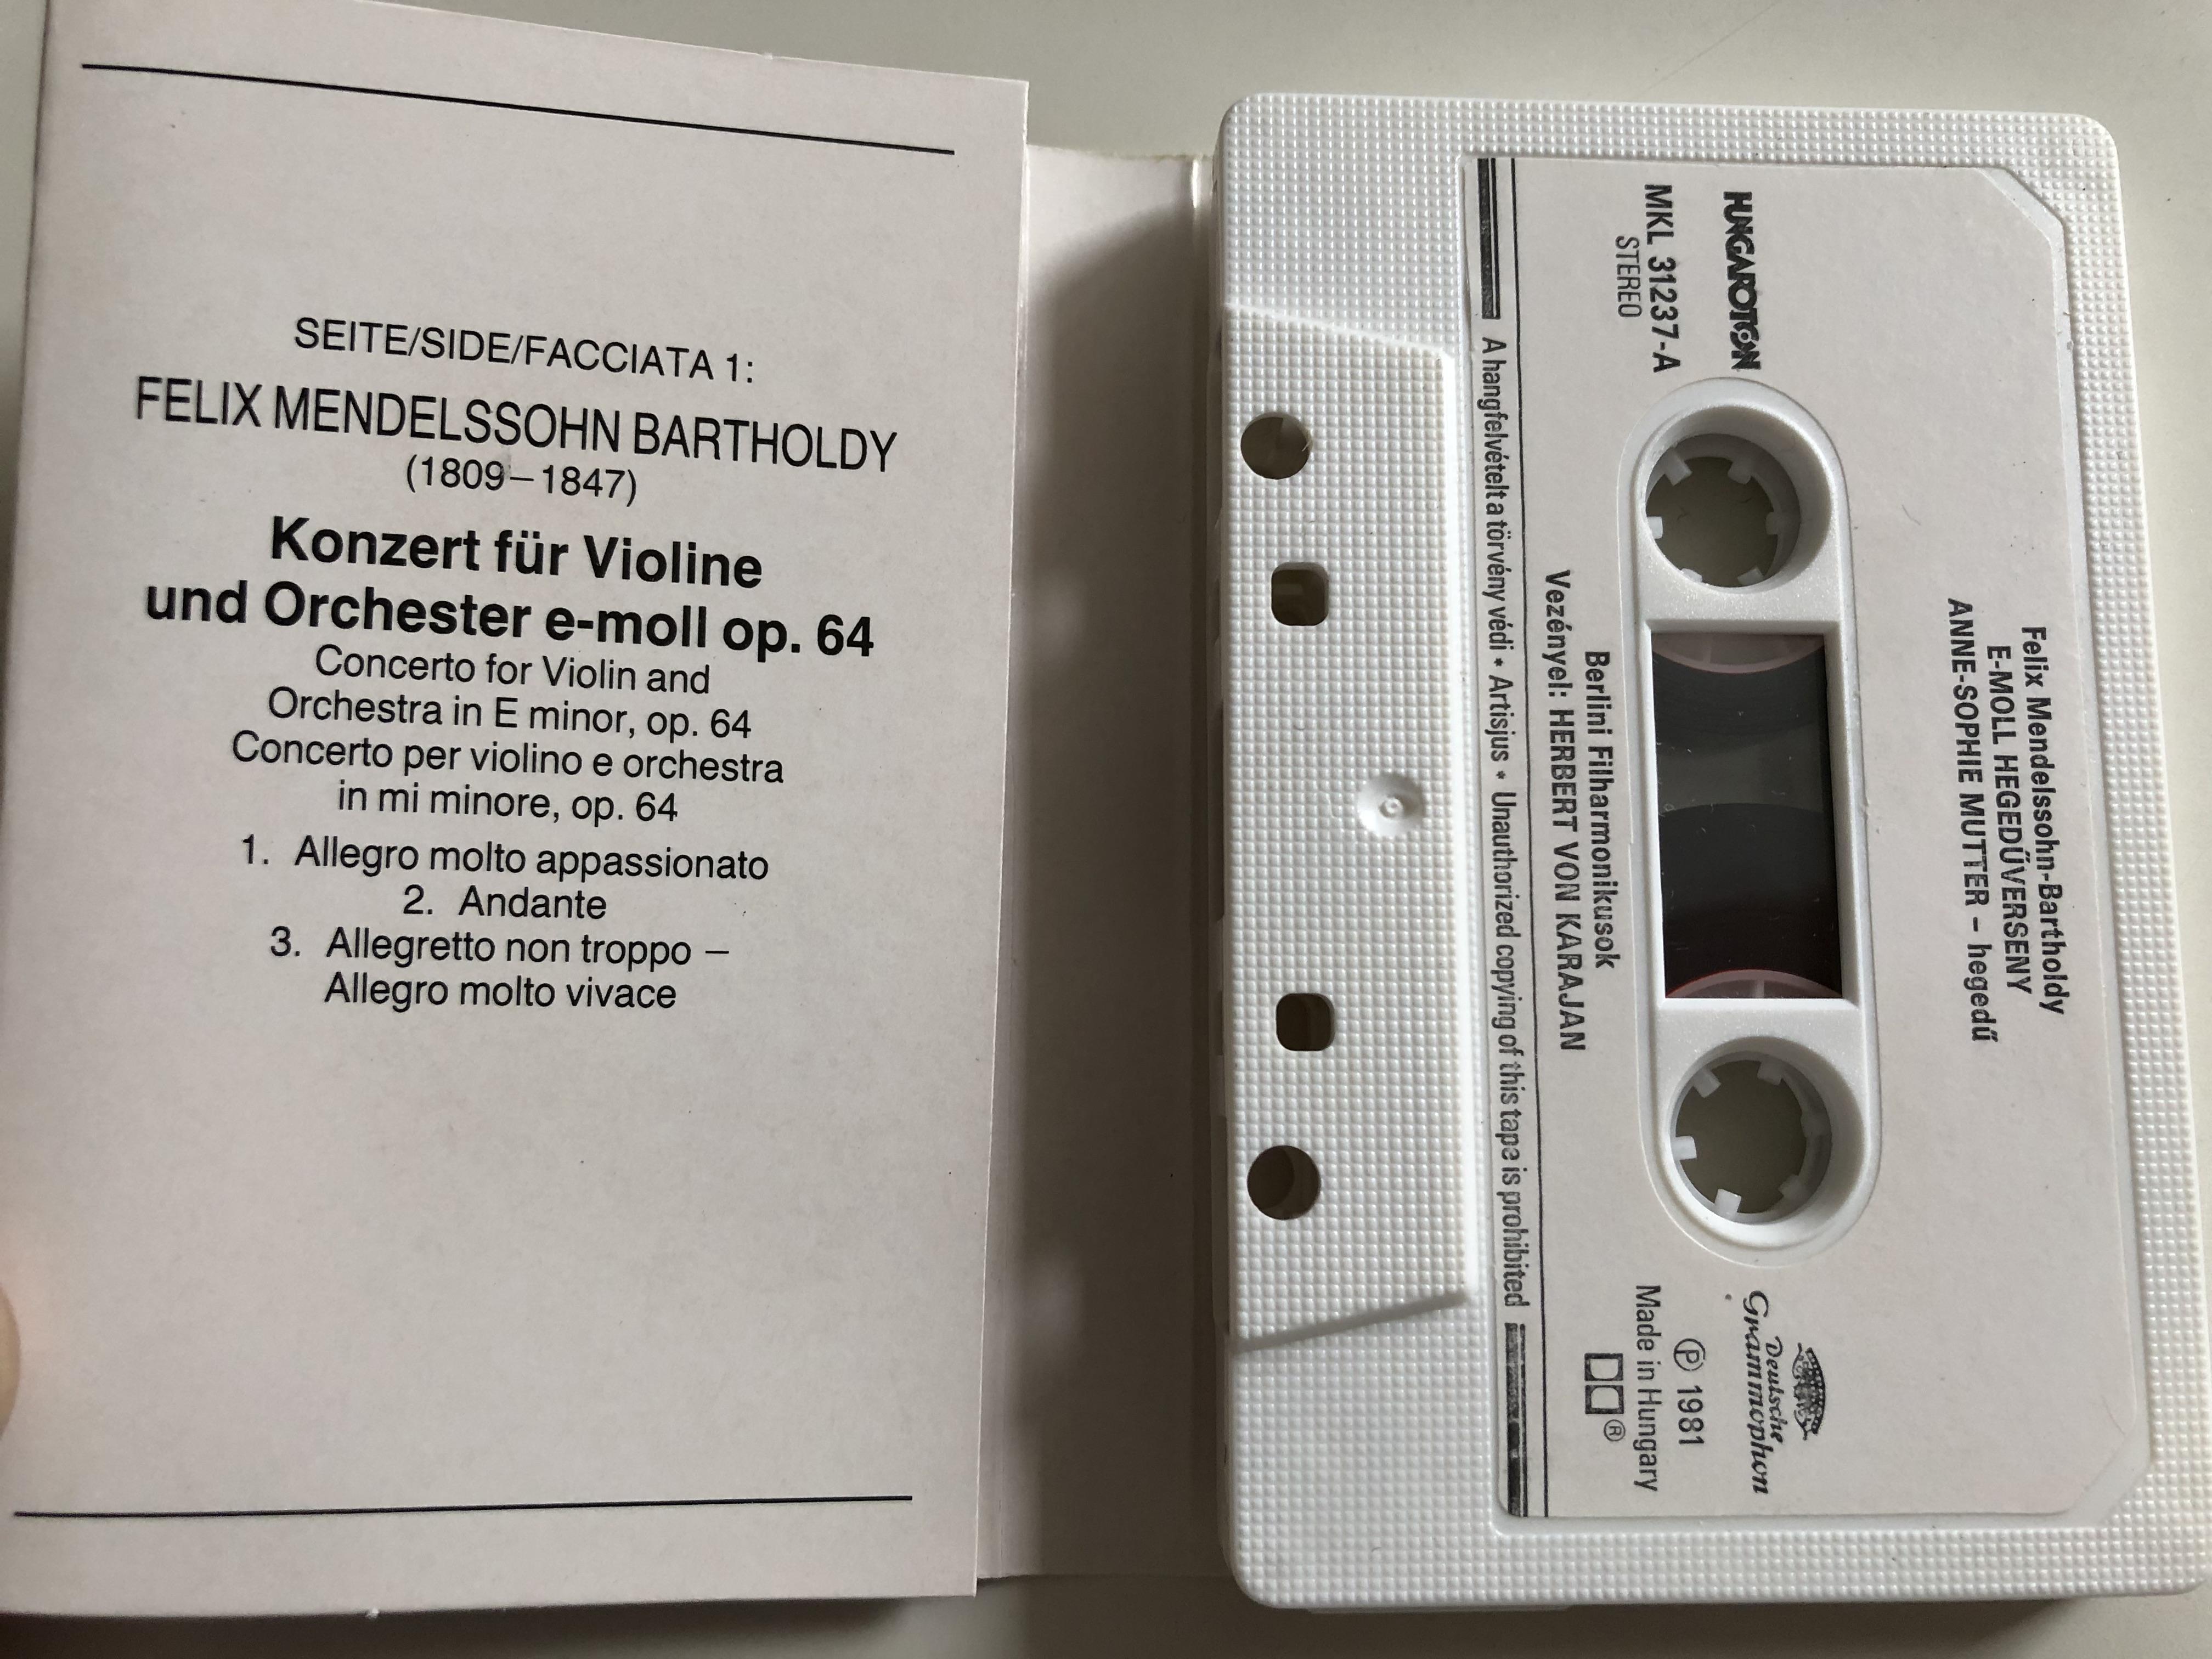 mendelssohn-bruch-violinkonzerte-anne-sophie-mutter-berliner-philharmoniker-conducted-herbert-von-karajan-deutsche-grammophon-hungaroton-cassette-stereo-mkl-31237-2-.jpg